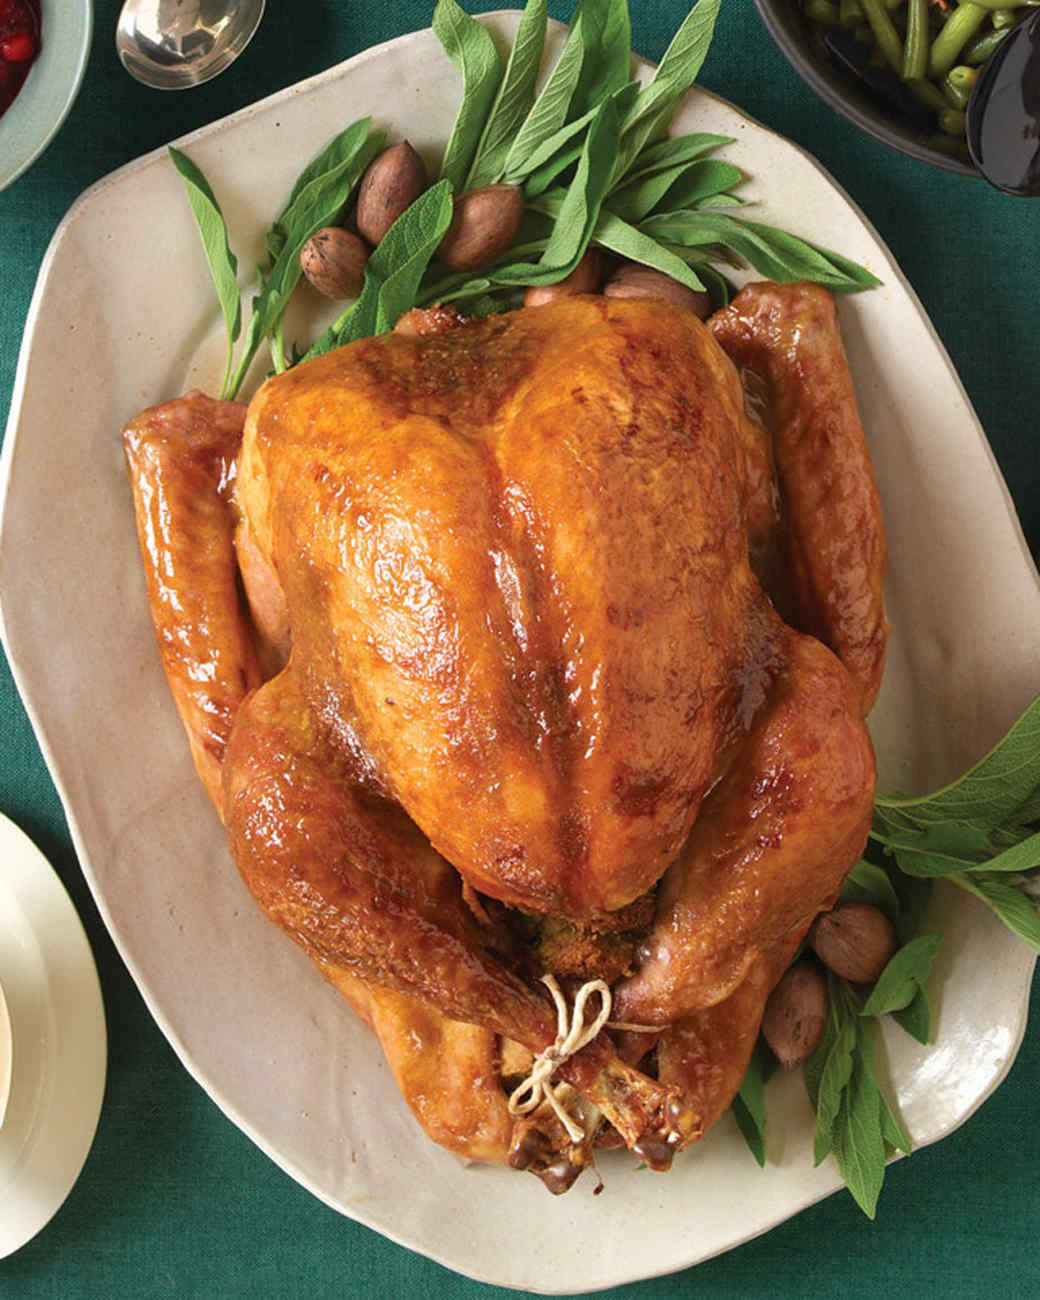 Thanksgiving Ham Glaze Recipes  Roast Turkey with Brown Sugar and Mustard Glaze Recipe